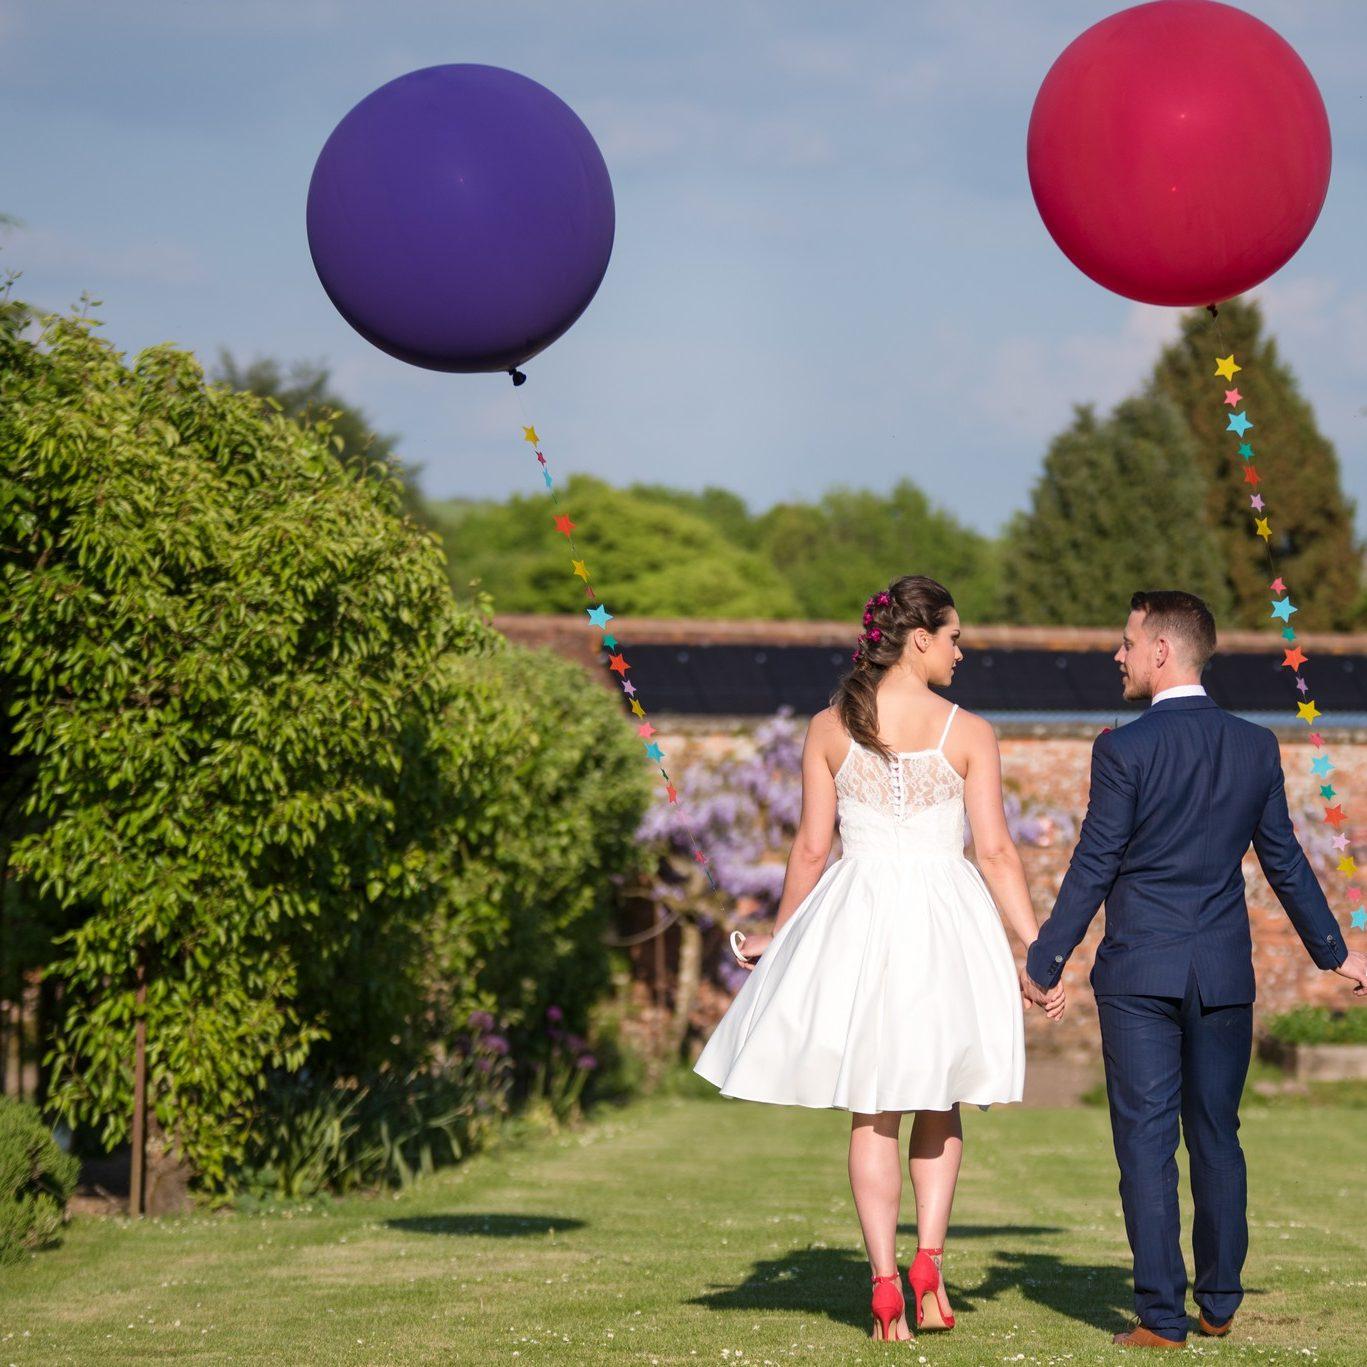 Bespoke & Beyond Weddings and Events